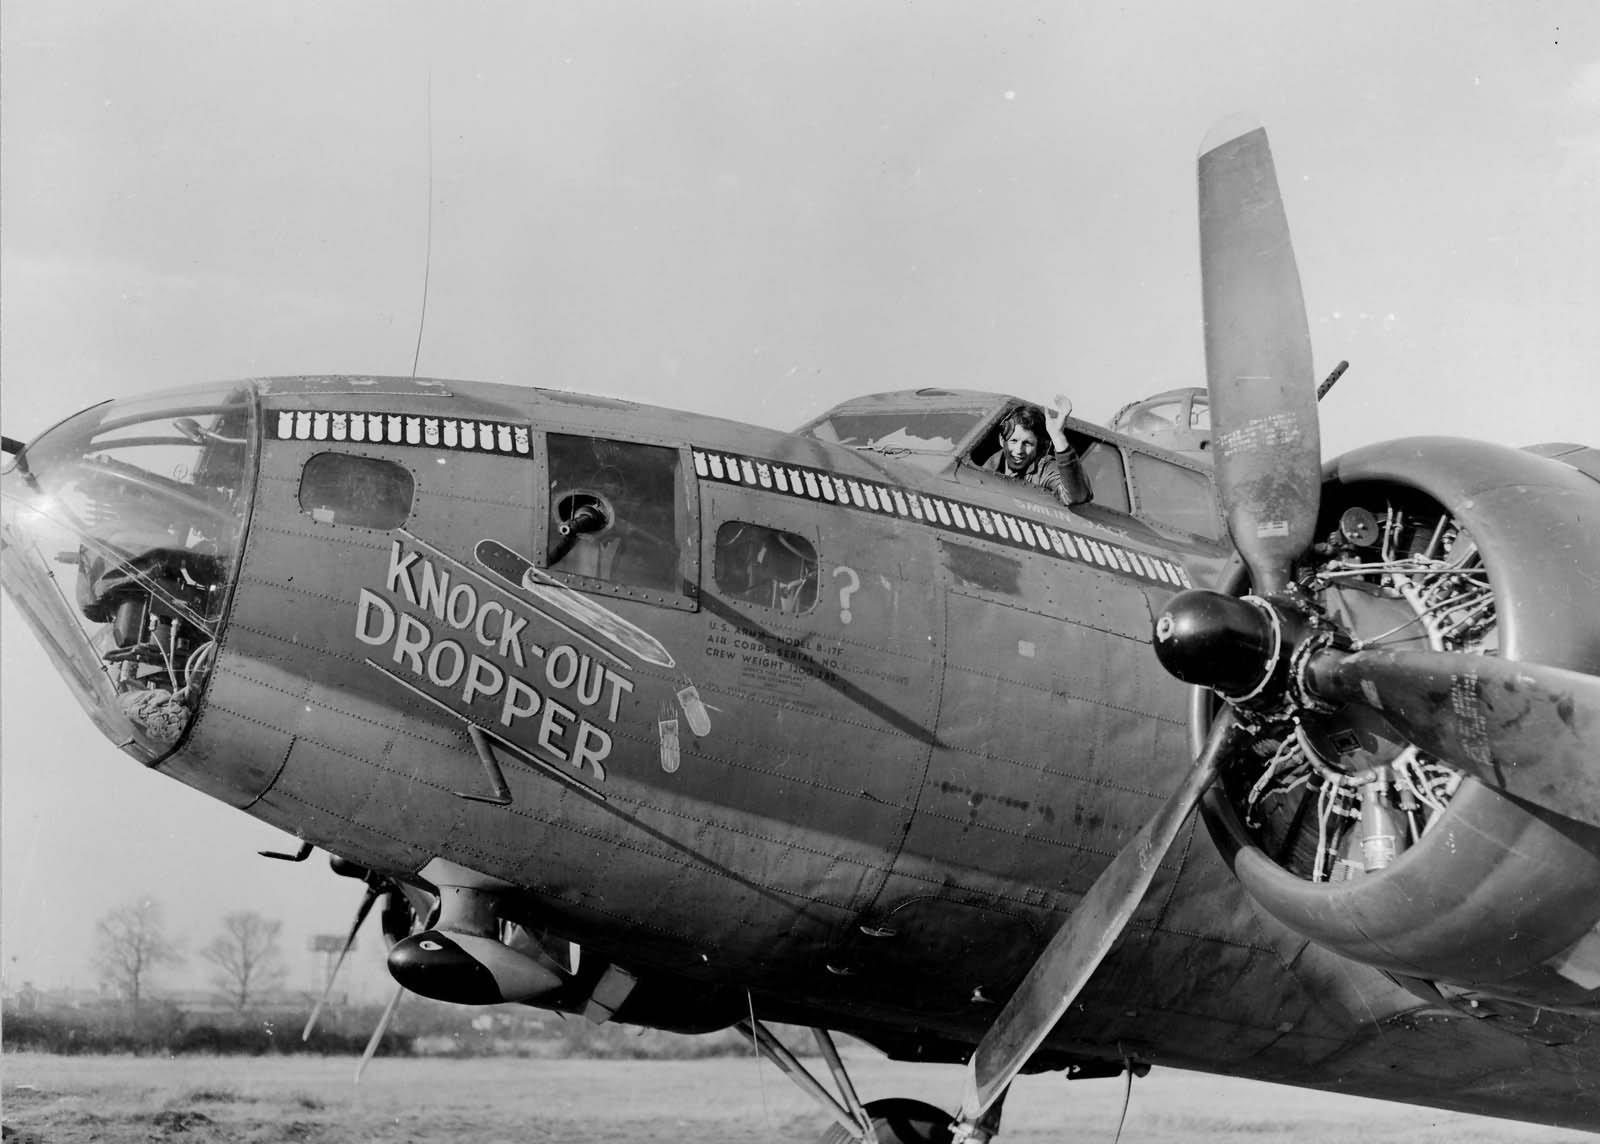 B-17F_303rd_Bomb_Group_Knock-Out_Dropper_Molesworth_England_1943.jpg